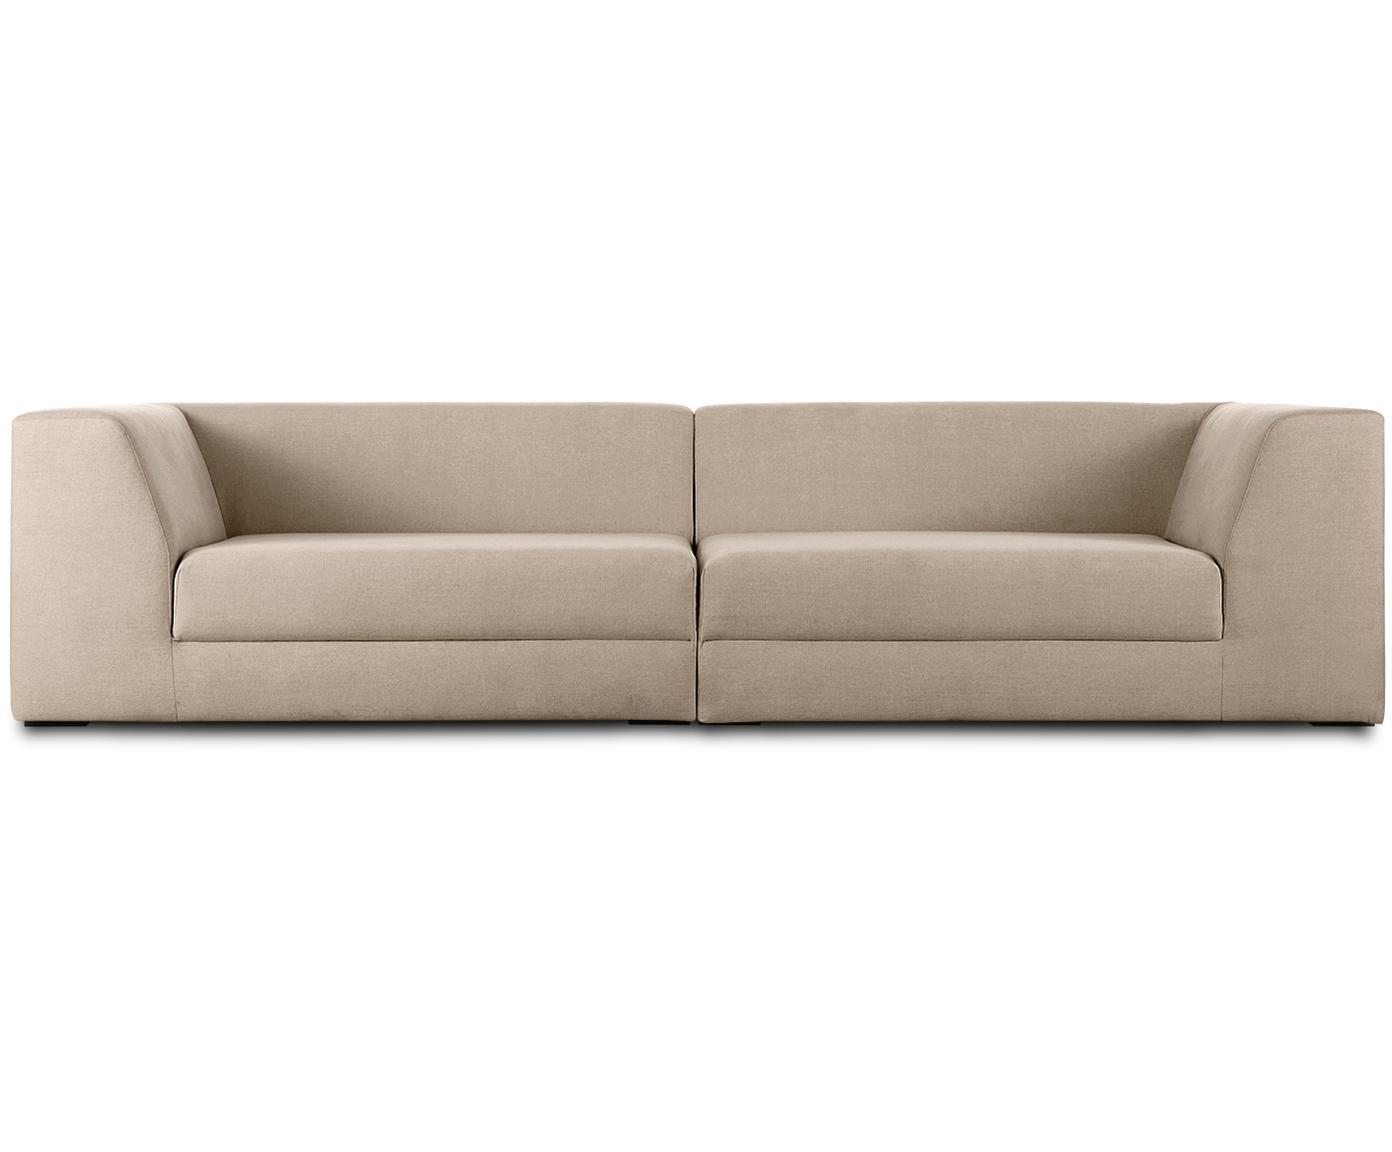 Modulares Sofa Grant (3-Sitzer), Bezug: Baumwolle 20.000 Scheuert, Gestell: Fichtenholz, Webstoff Taupe, B 266 x T 106 cm